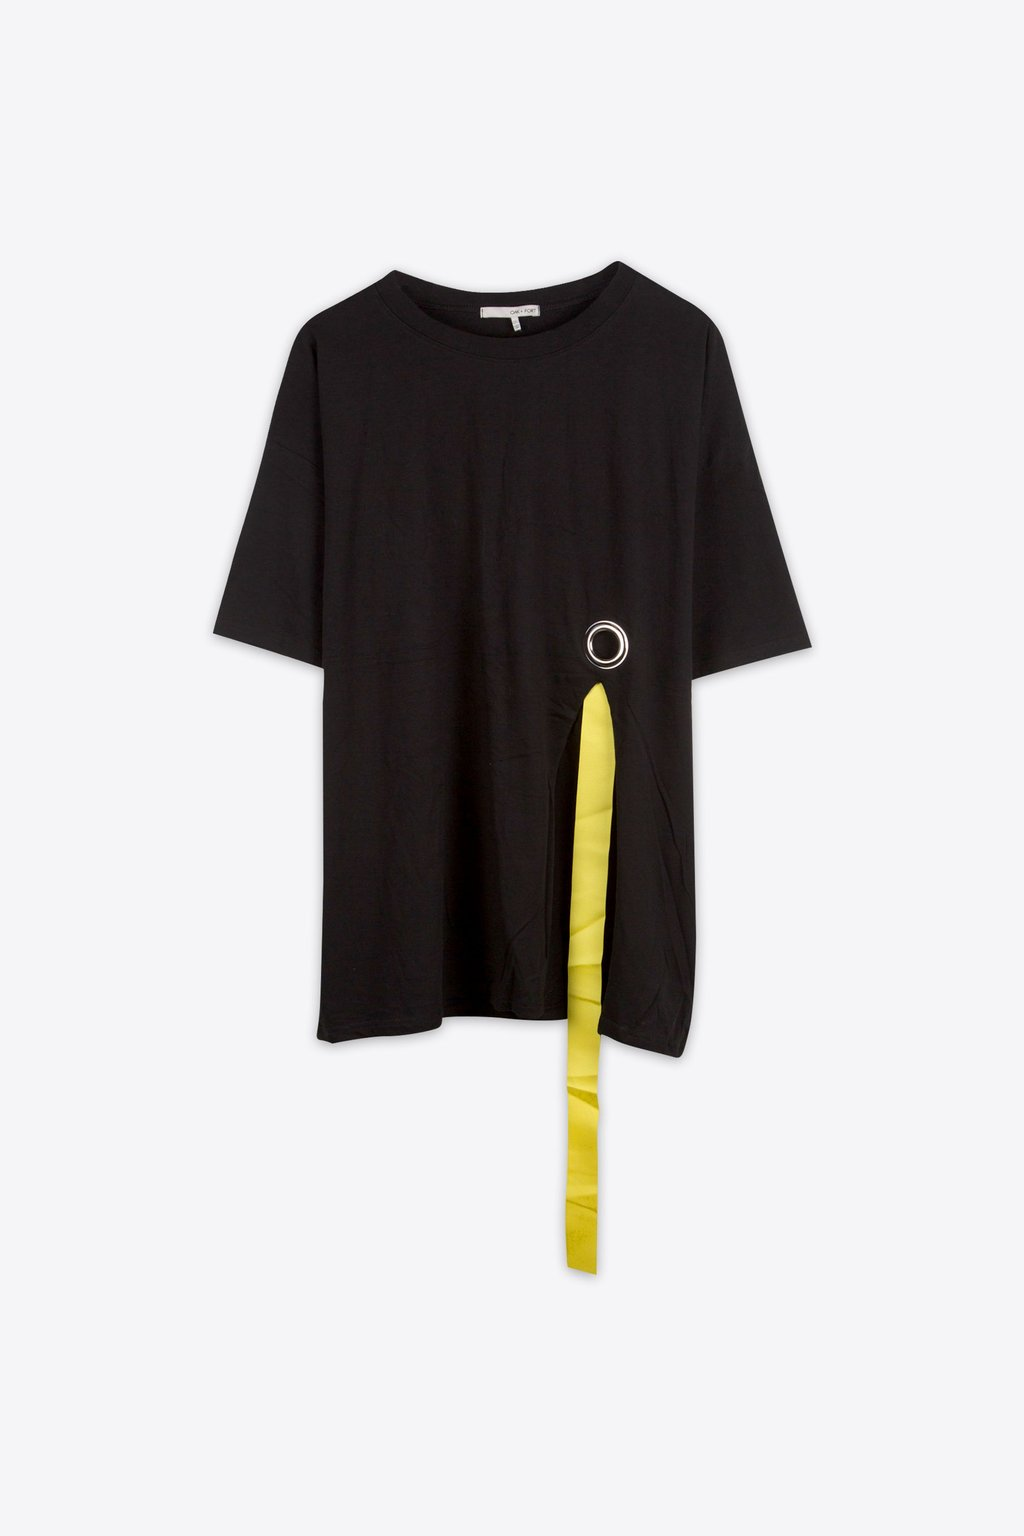 TShirt H291 Yellow 5